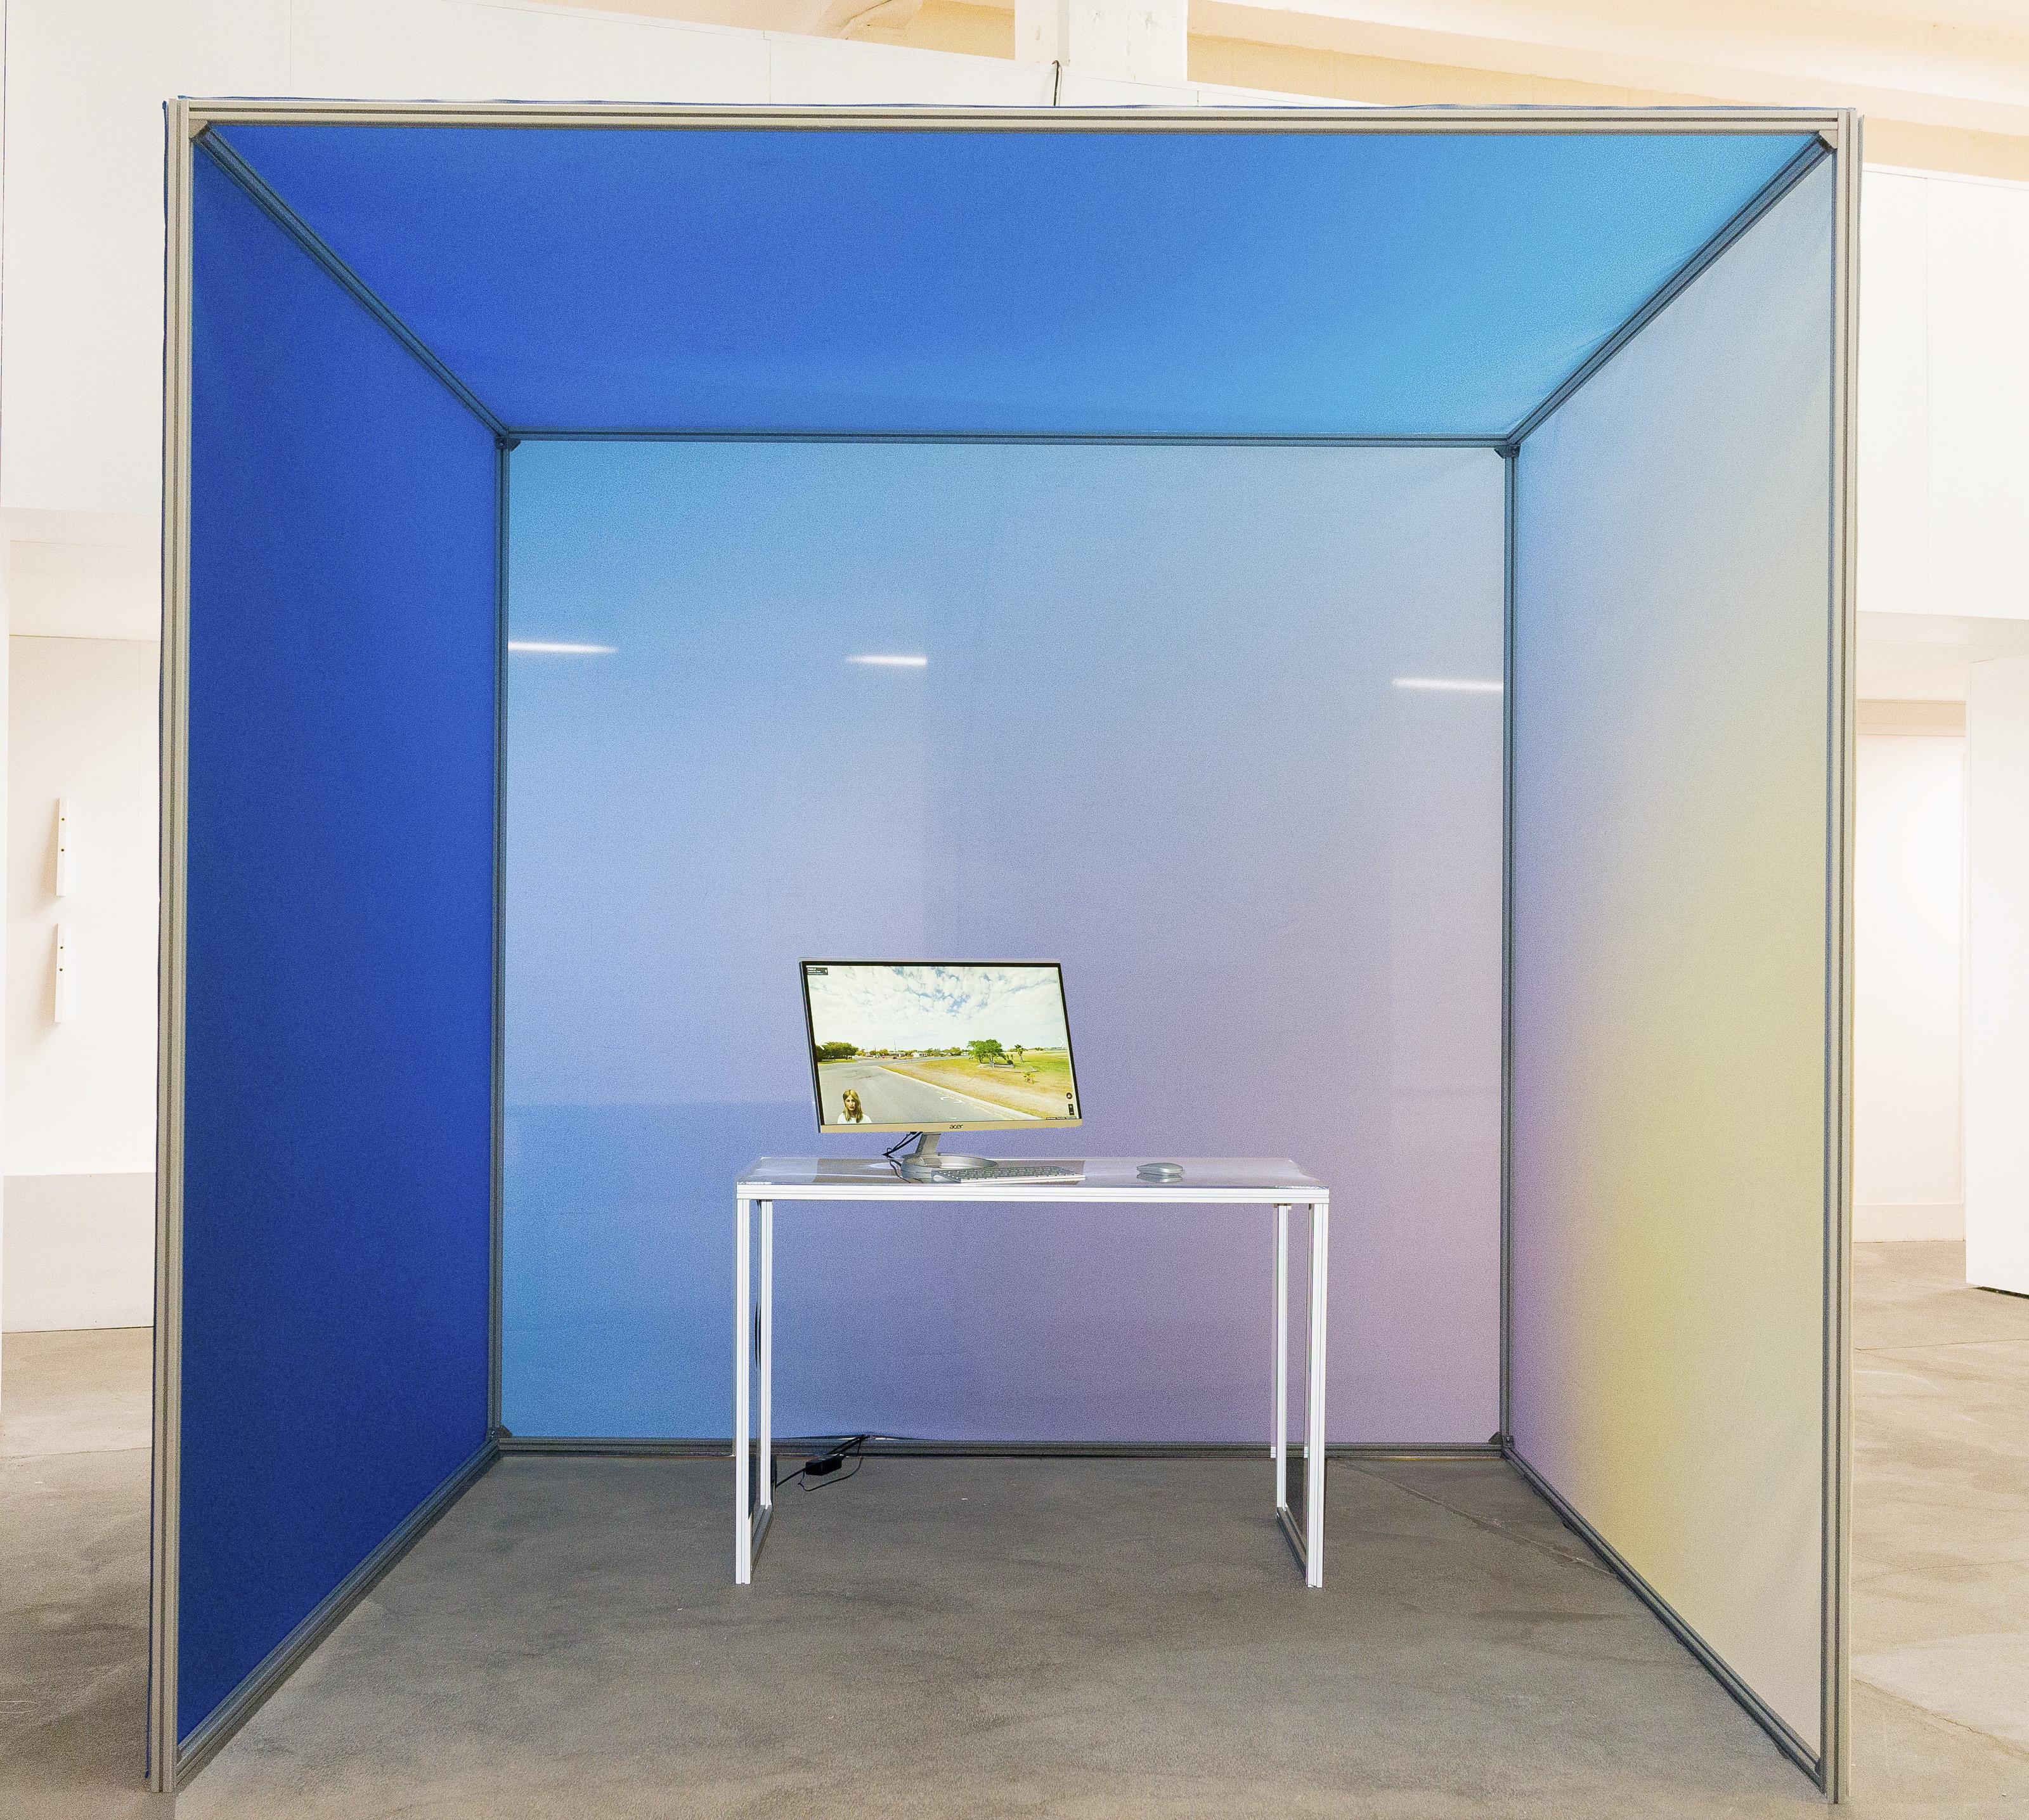 "Johanna Flato, ""DRAFTx.IO"" installation view, Harlesden High Street, London, 2019 (photo courtesy of Jonny Tanna)"